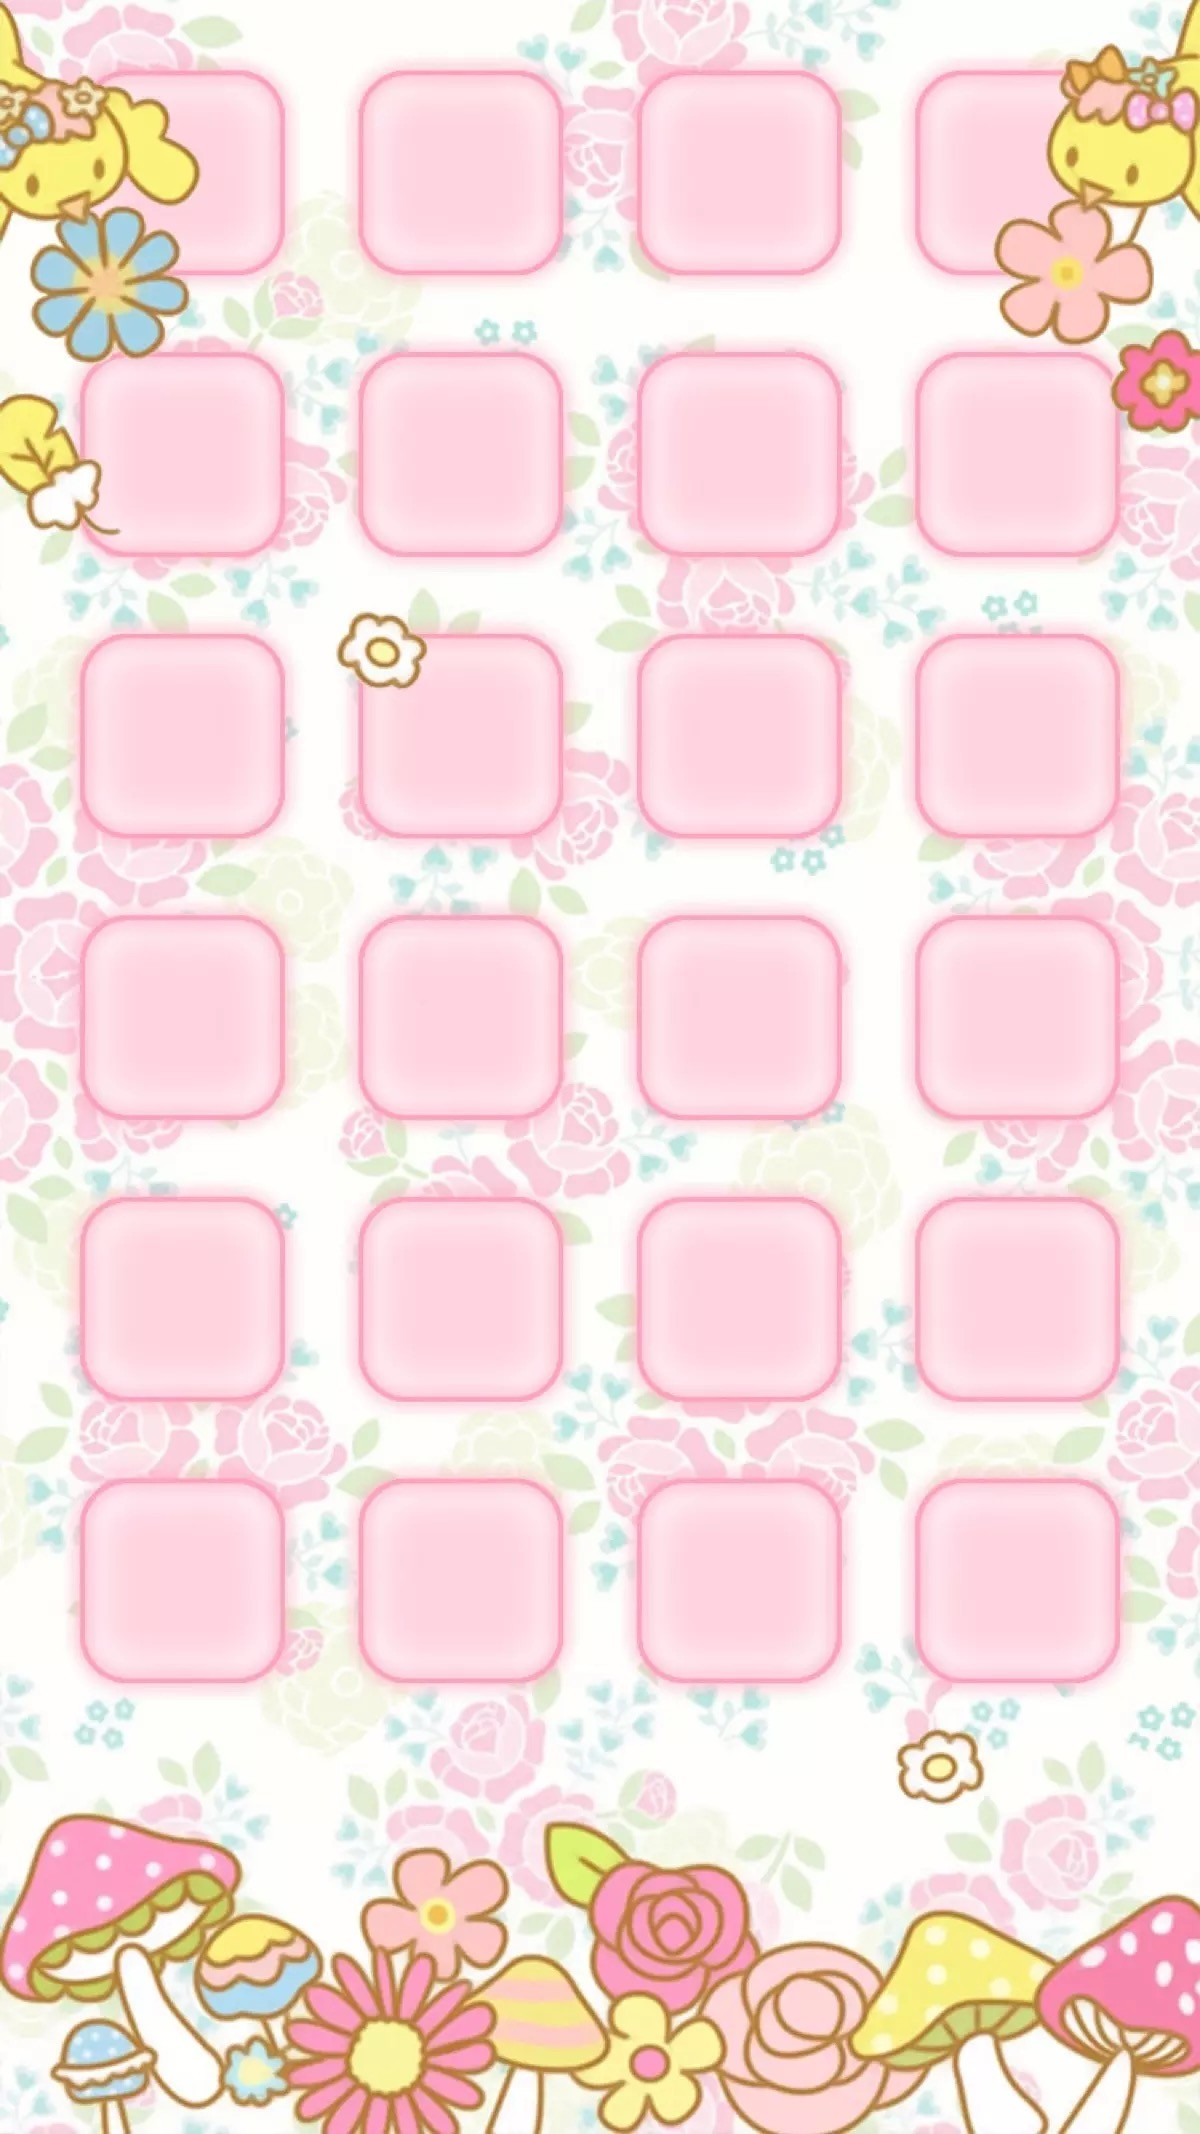 Wallpaper Shelves, Sanrio, Phone Wallpapers, Iphone 7, Twin, Kawaii,  Screens, Walls, Screen